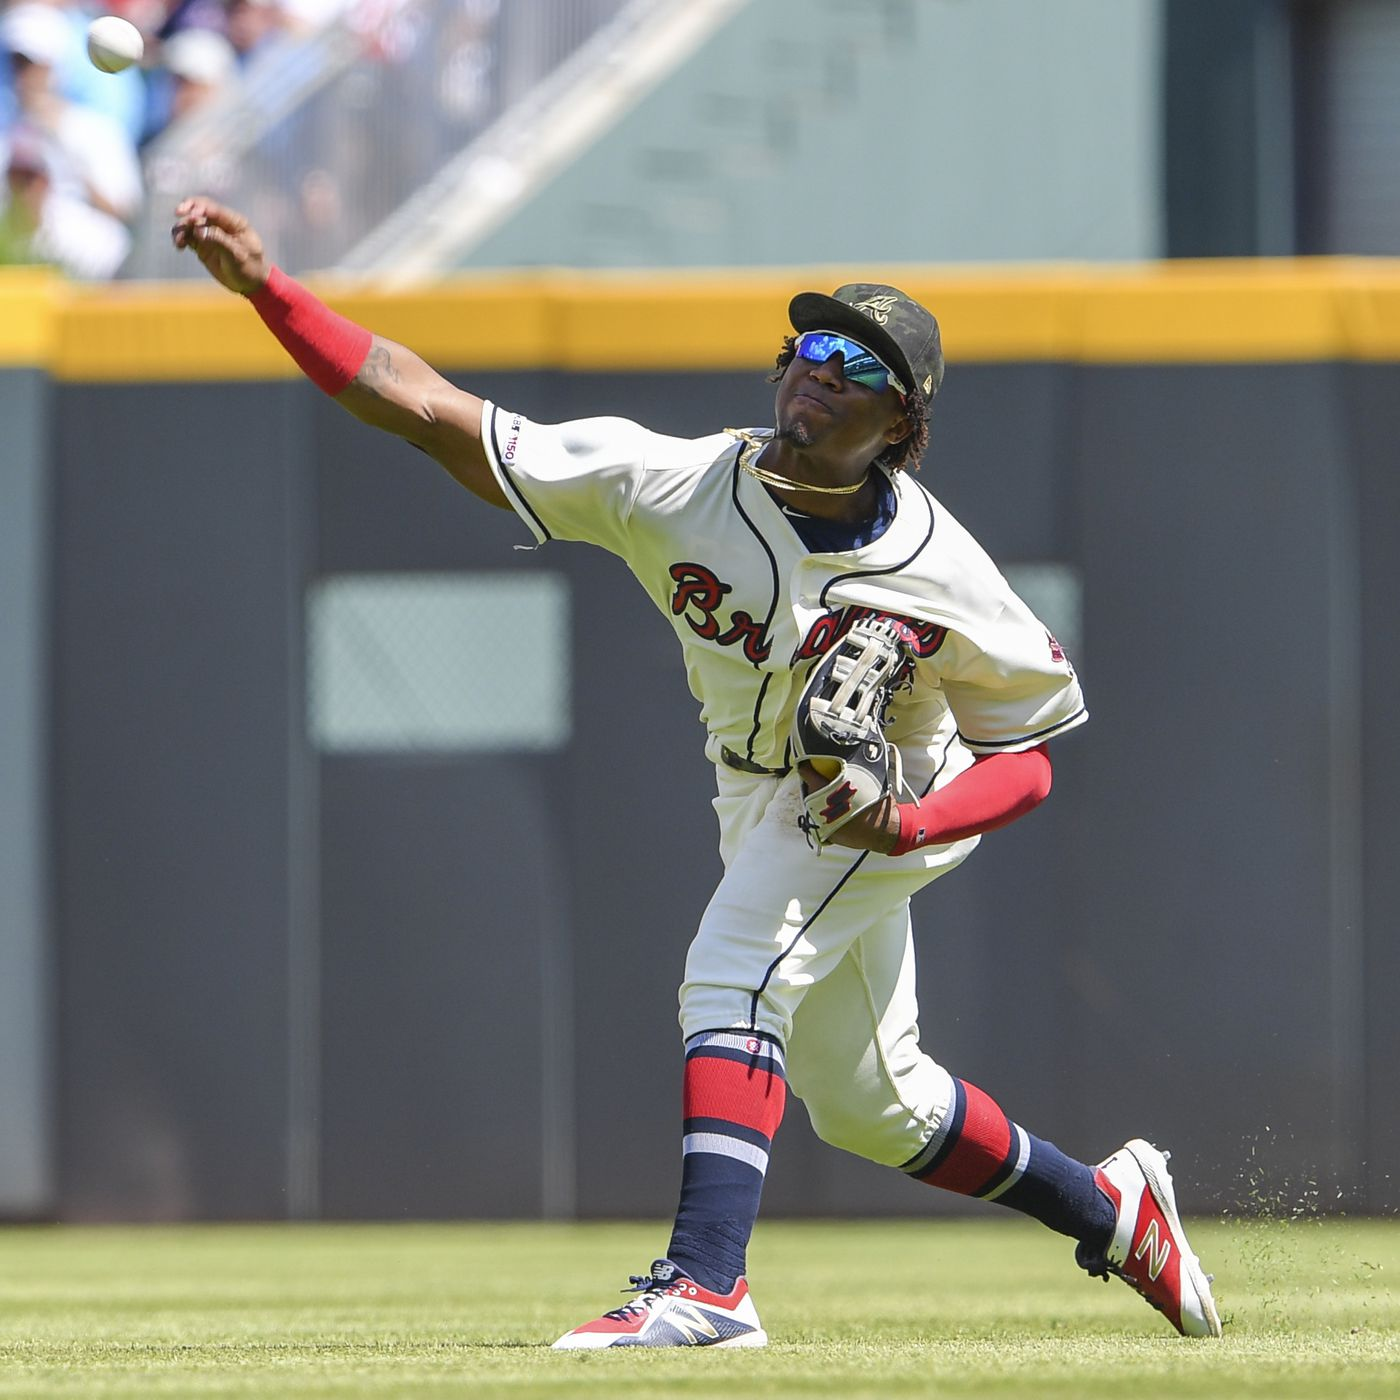 Size: 8 x 10 Ronald Acuna Atlanta Braves First MLB Game Photo